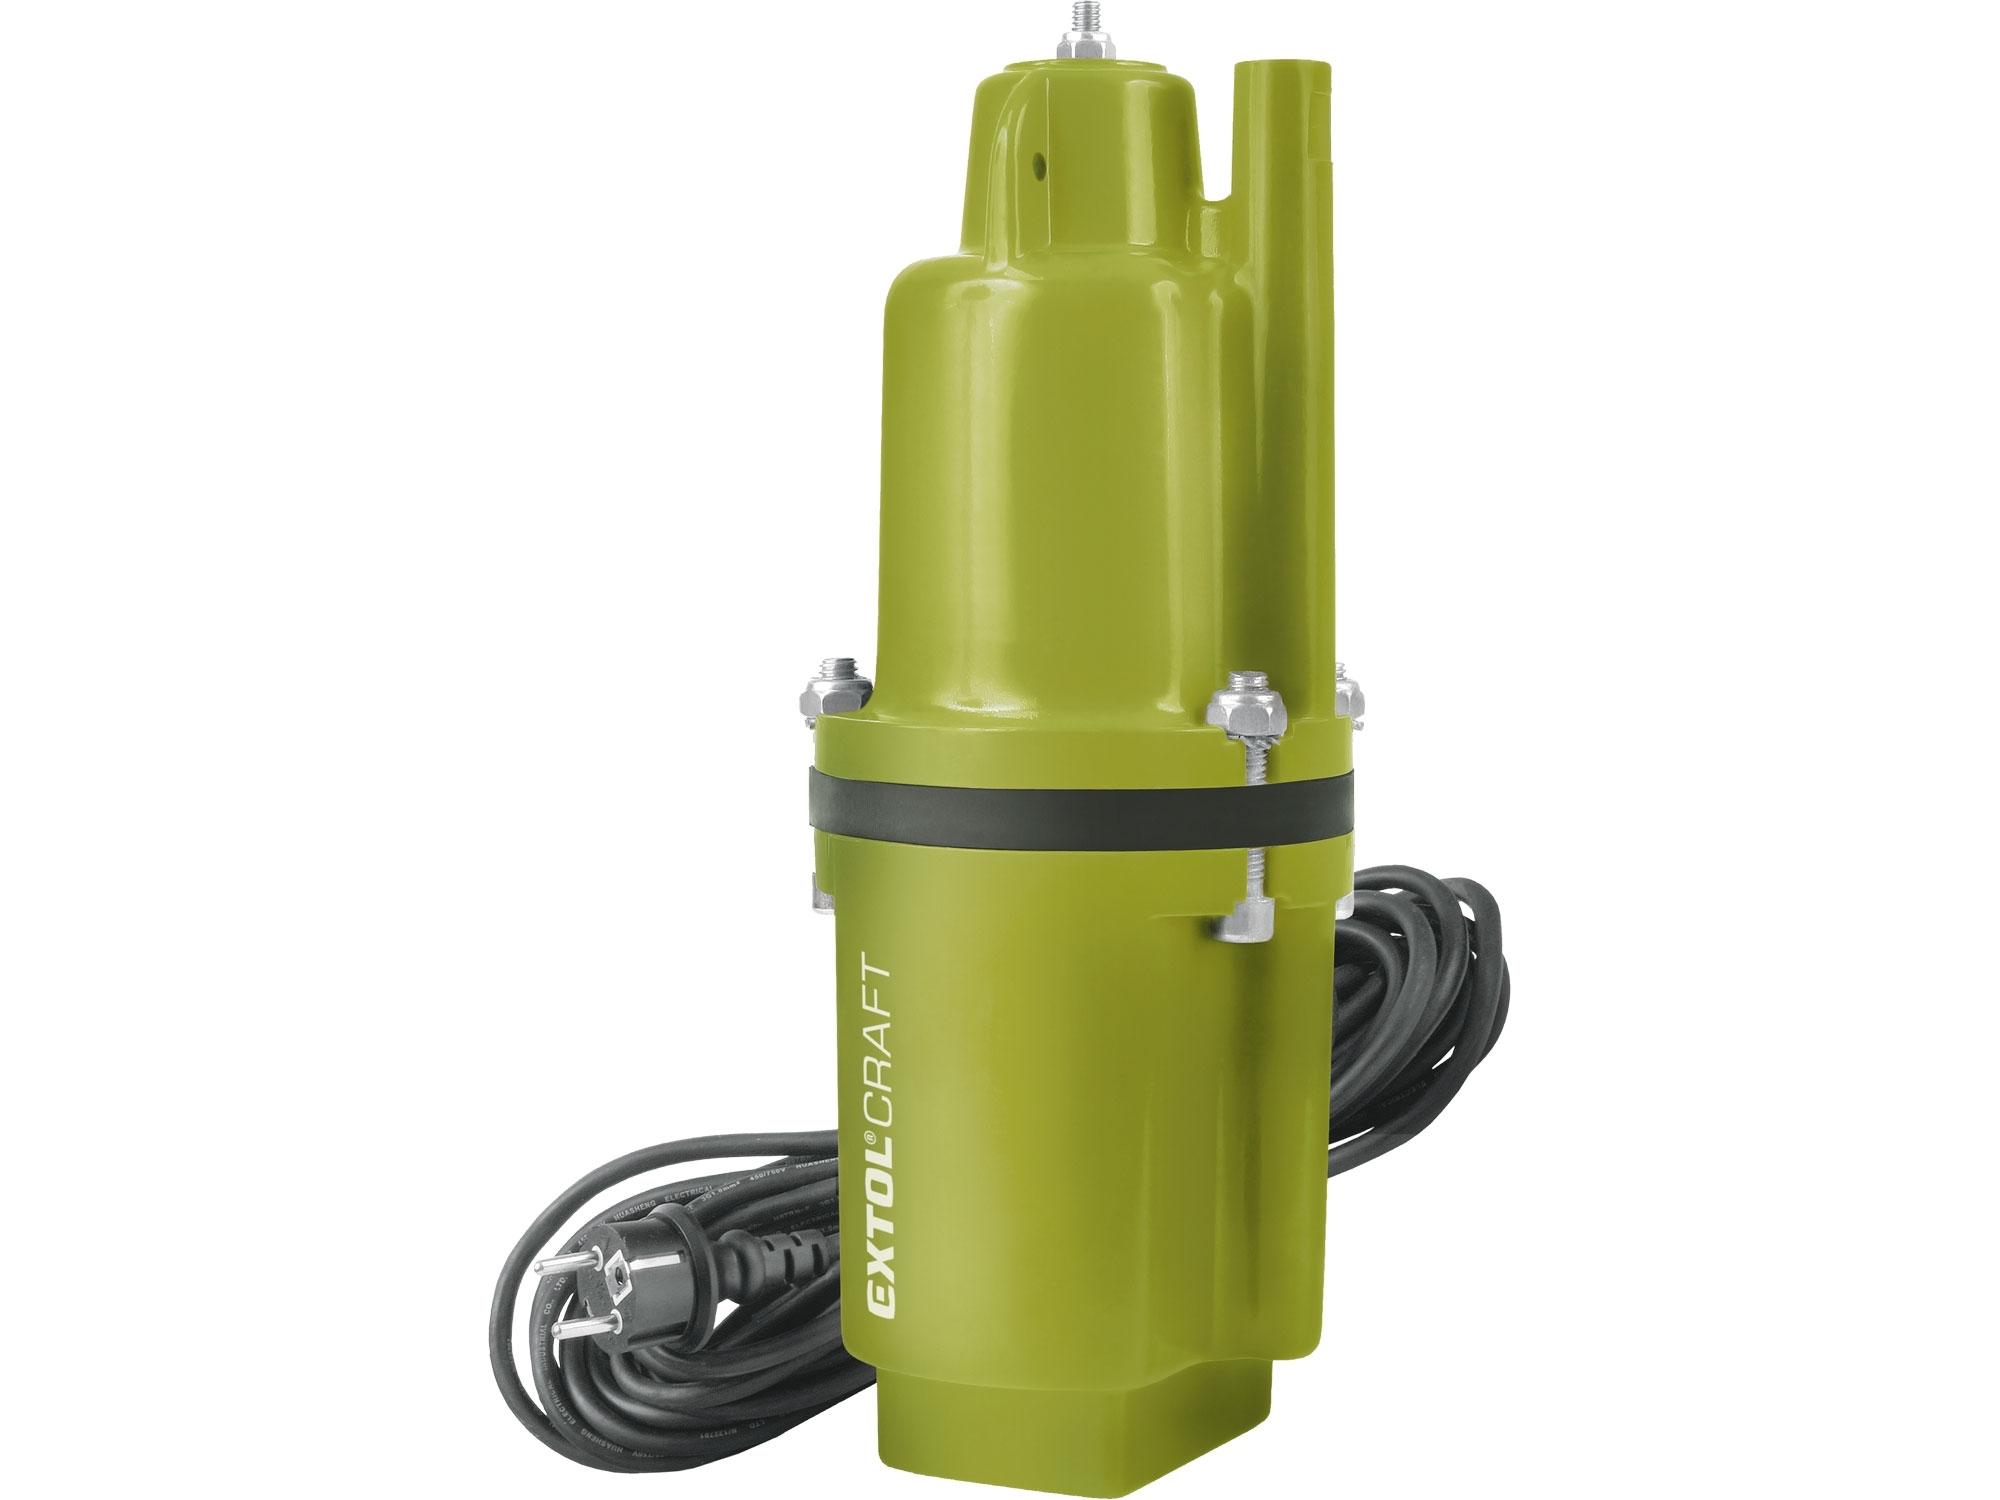 čerpadlo membránové hlubinné ponorné, 600W, 2000l/hod, 20m, EXTOL CRAFT 414176